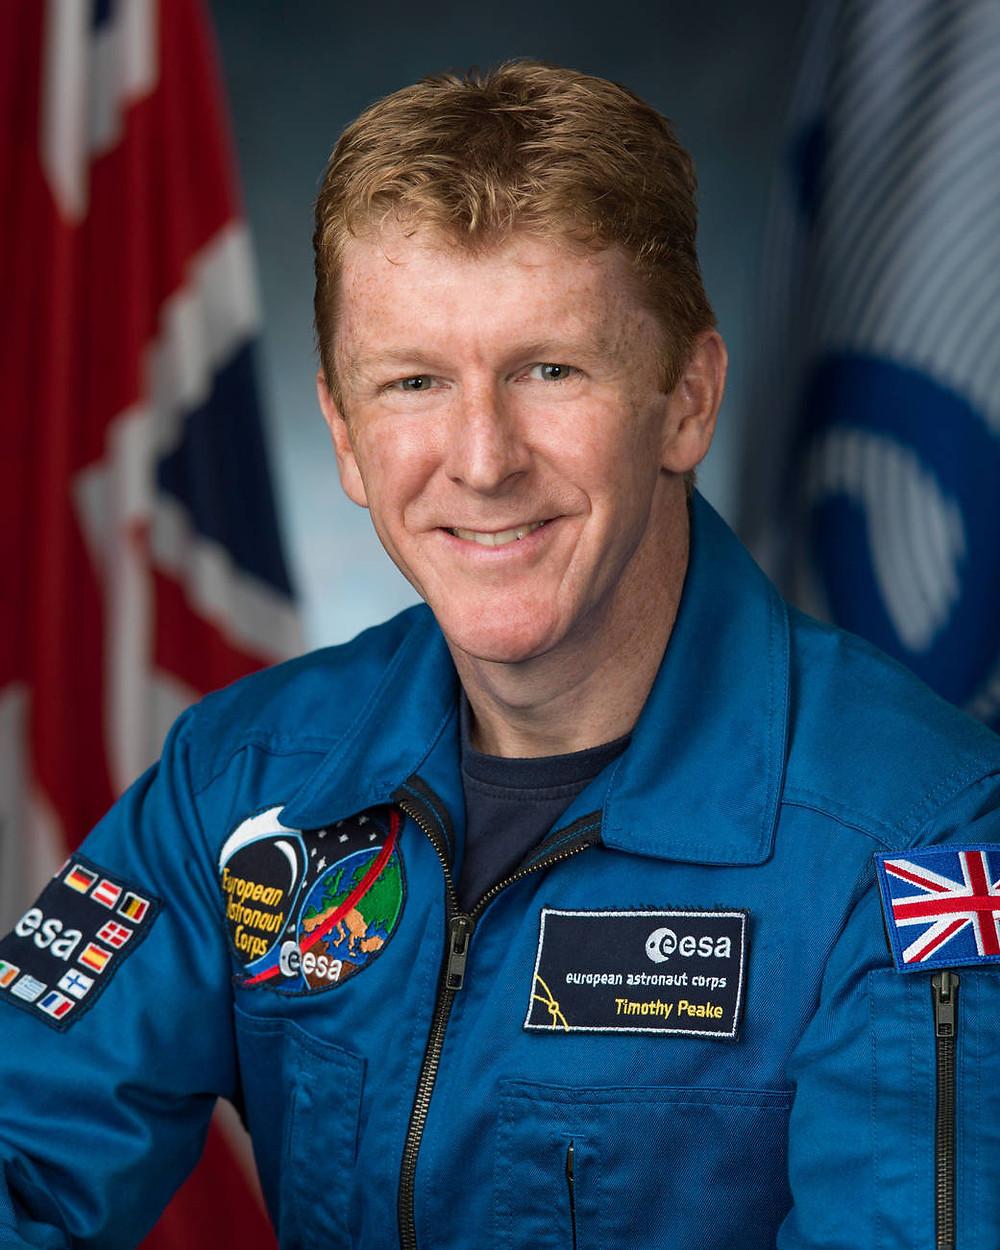 Astronaut Tim Peake joins Skyrora's advisory board